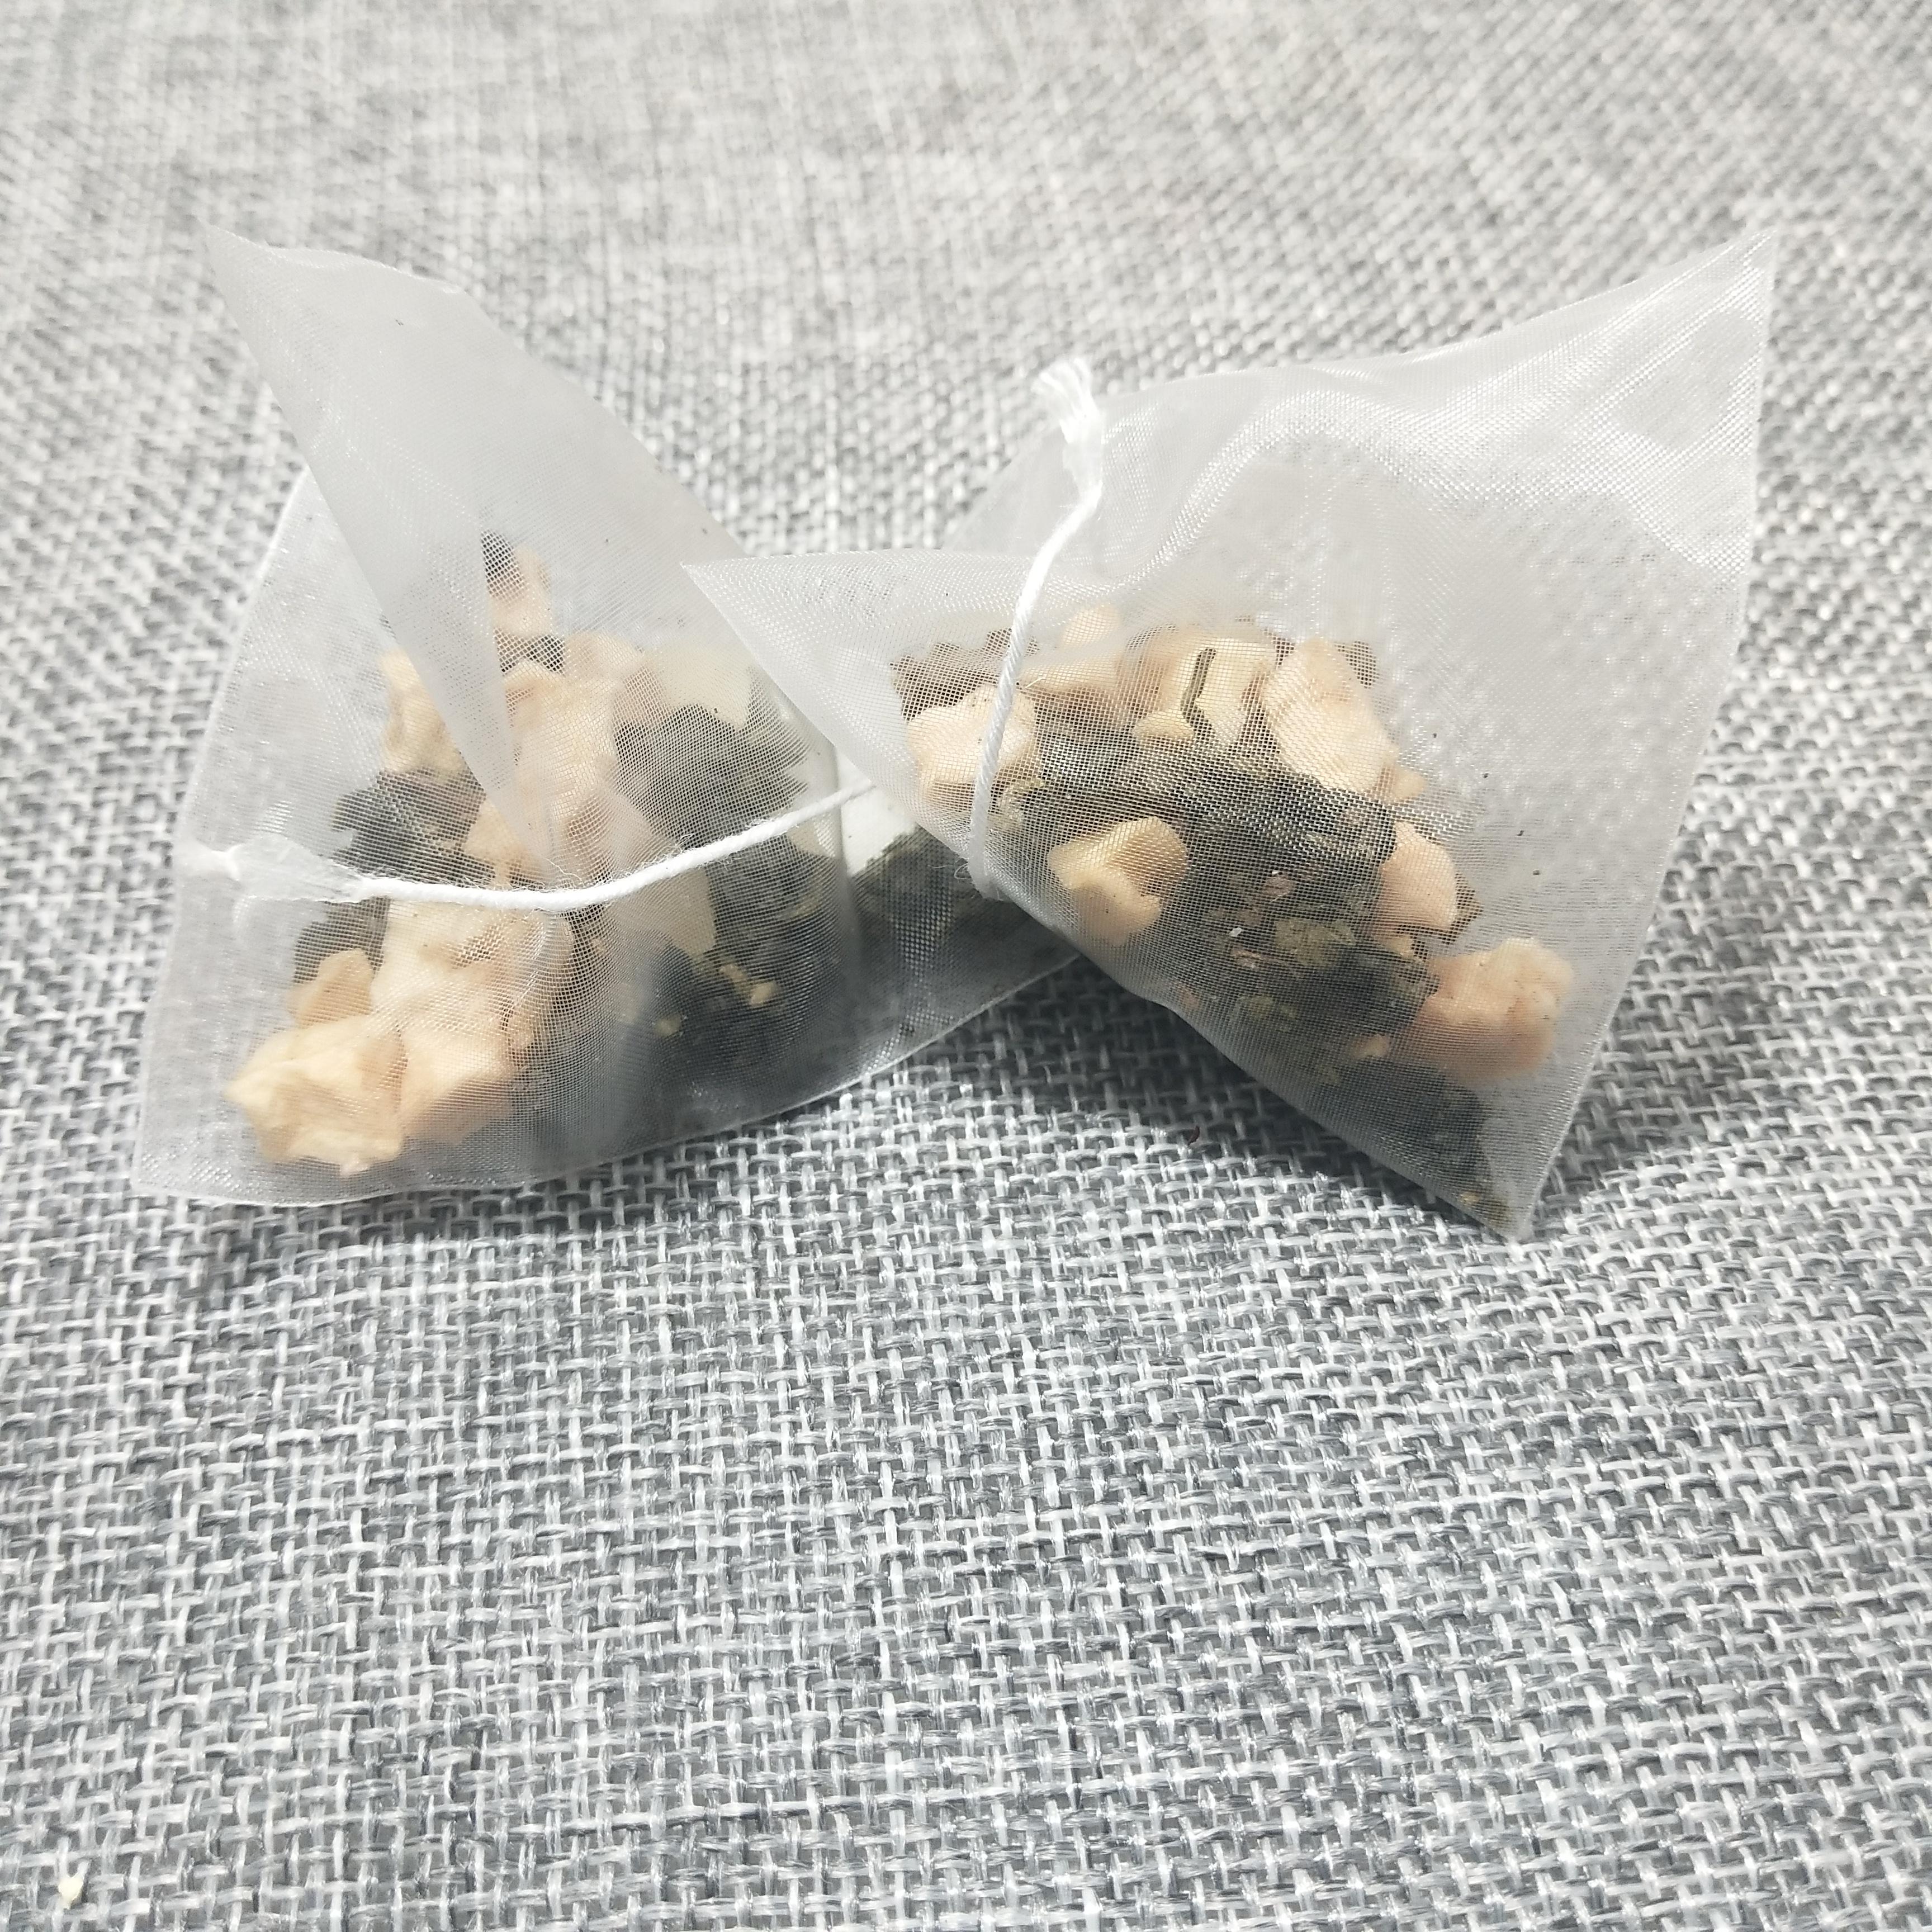 T152 Wholesale Nylon Pyramid Tea Bags Peach Oolong Tea - 4uTea | 4uTea.com